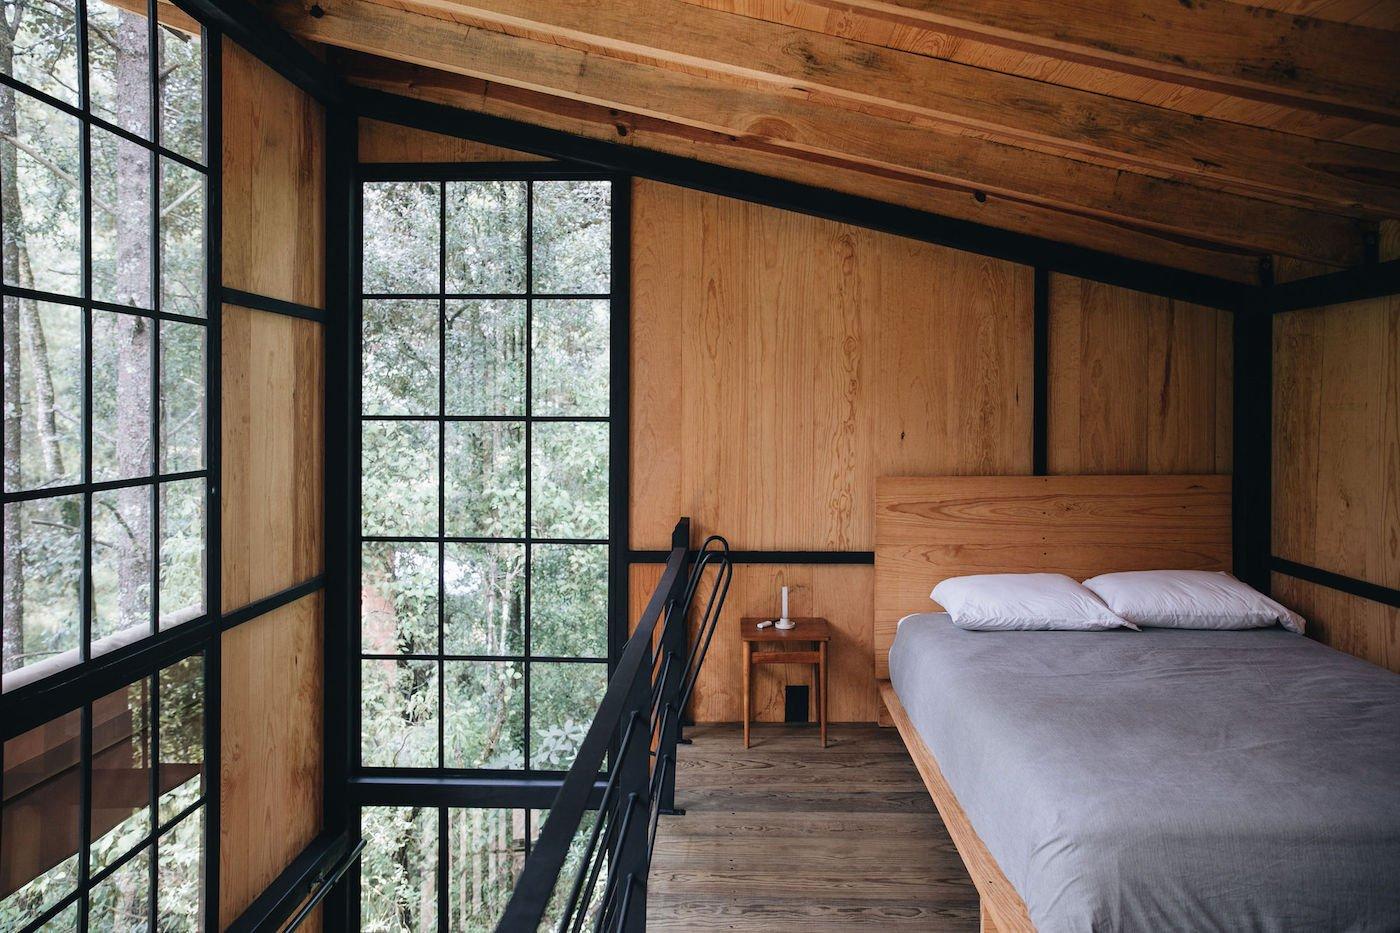 Loft bedroom in off-grid timber cabin